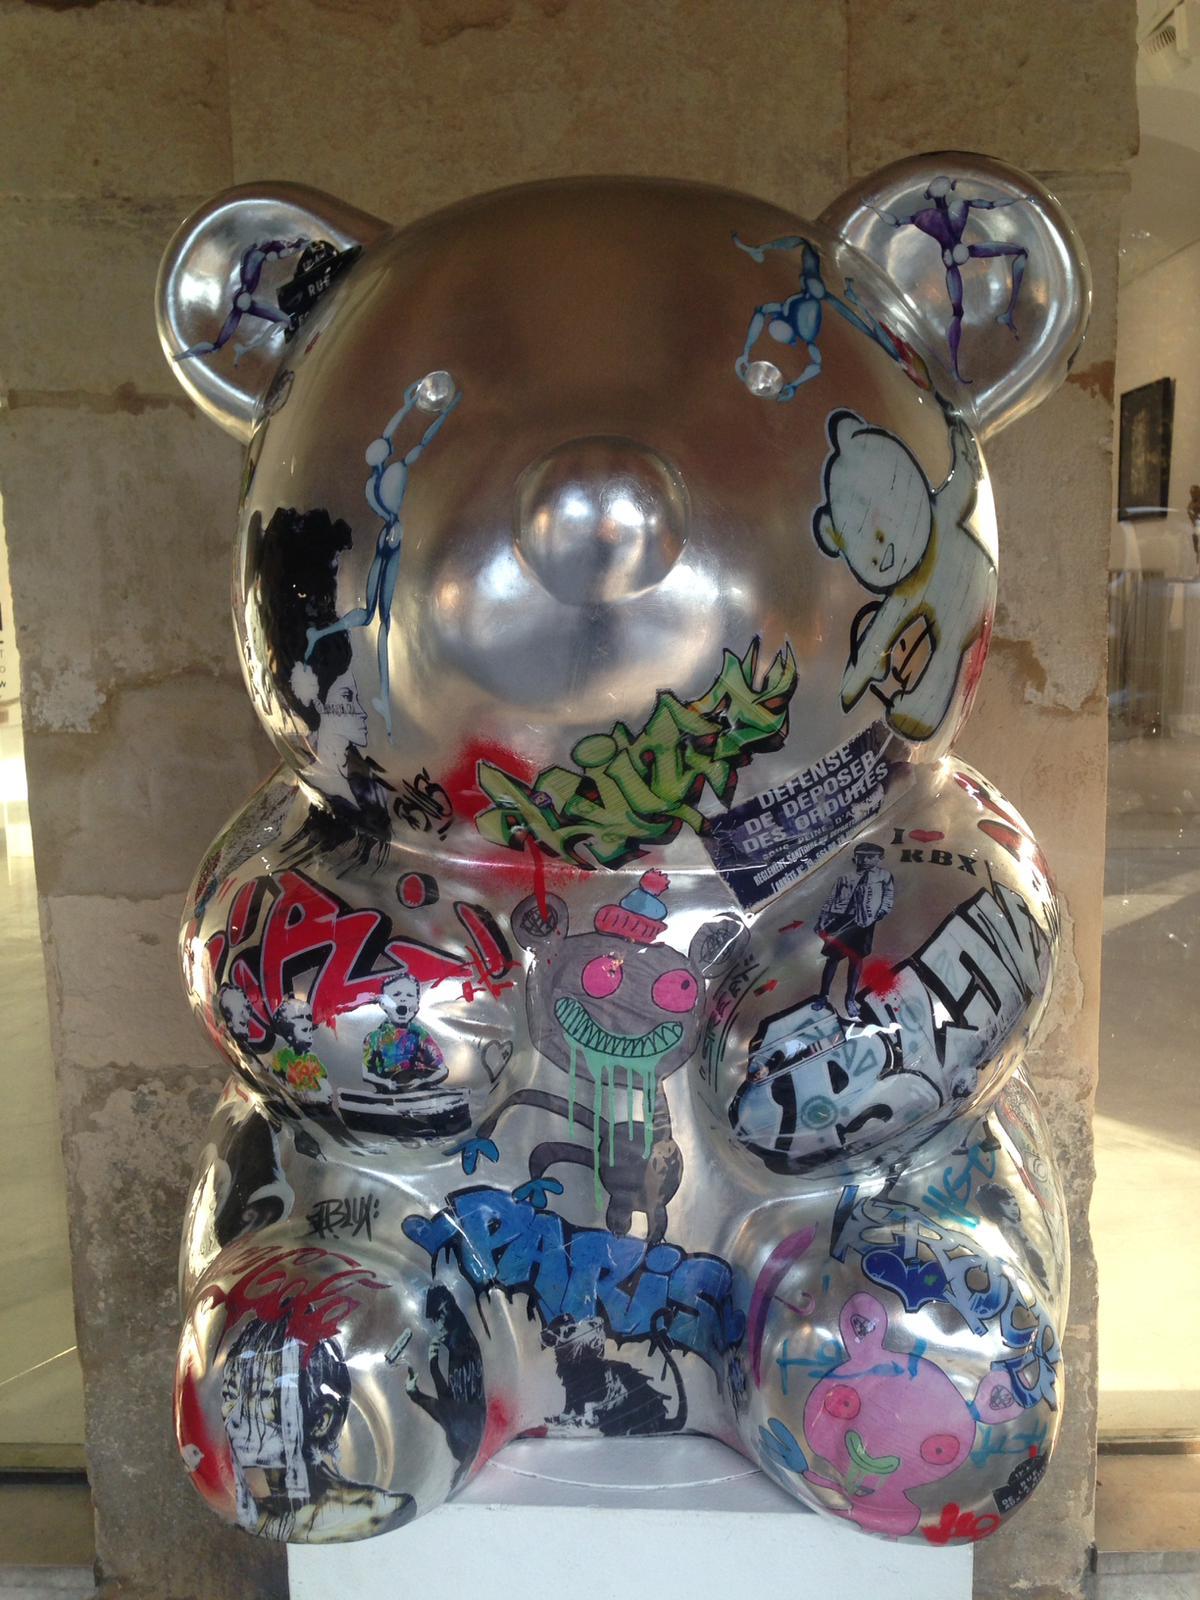 NATHALIE LAUDON | NOUNOURS STREET ART